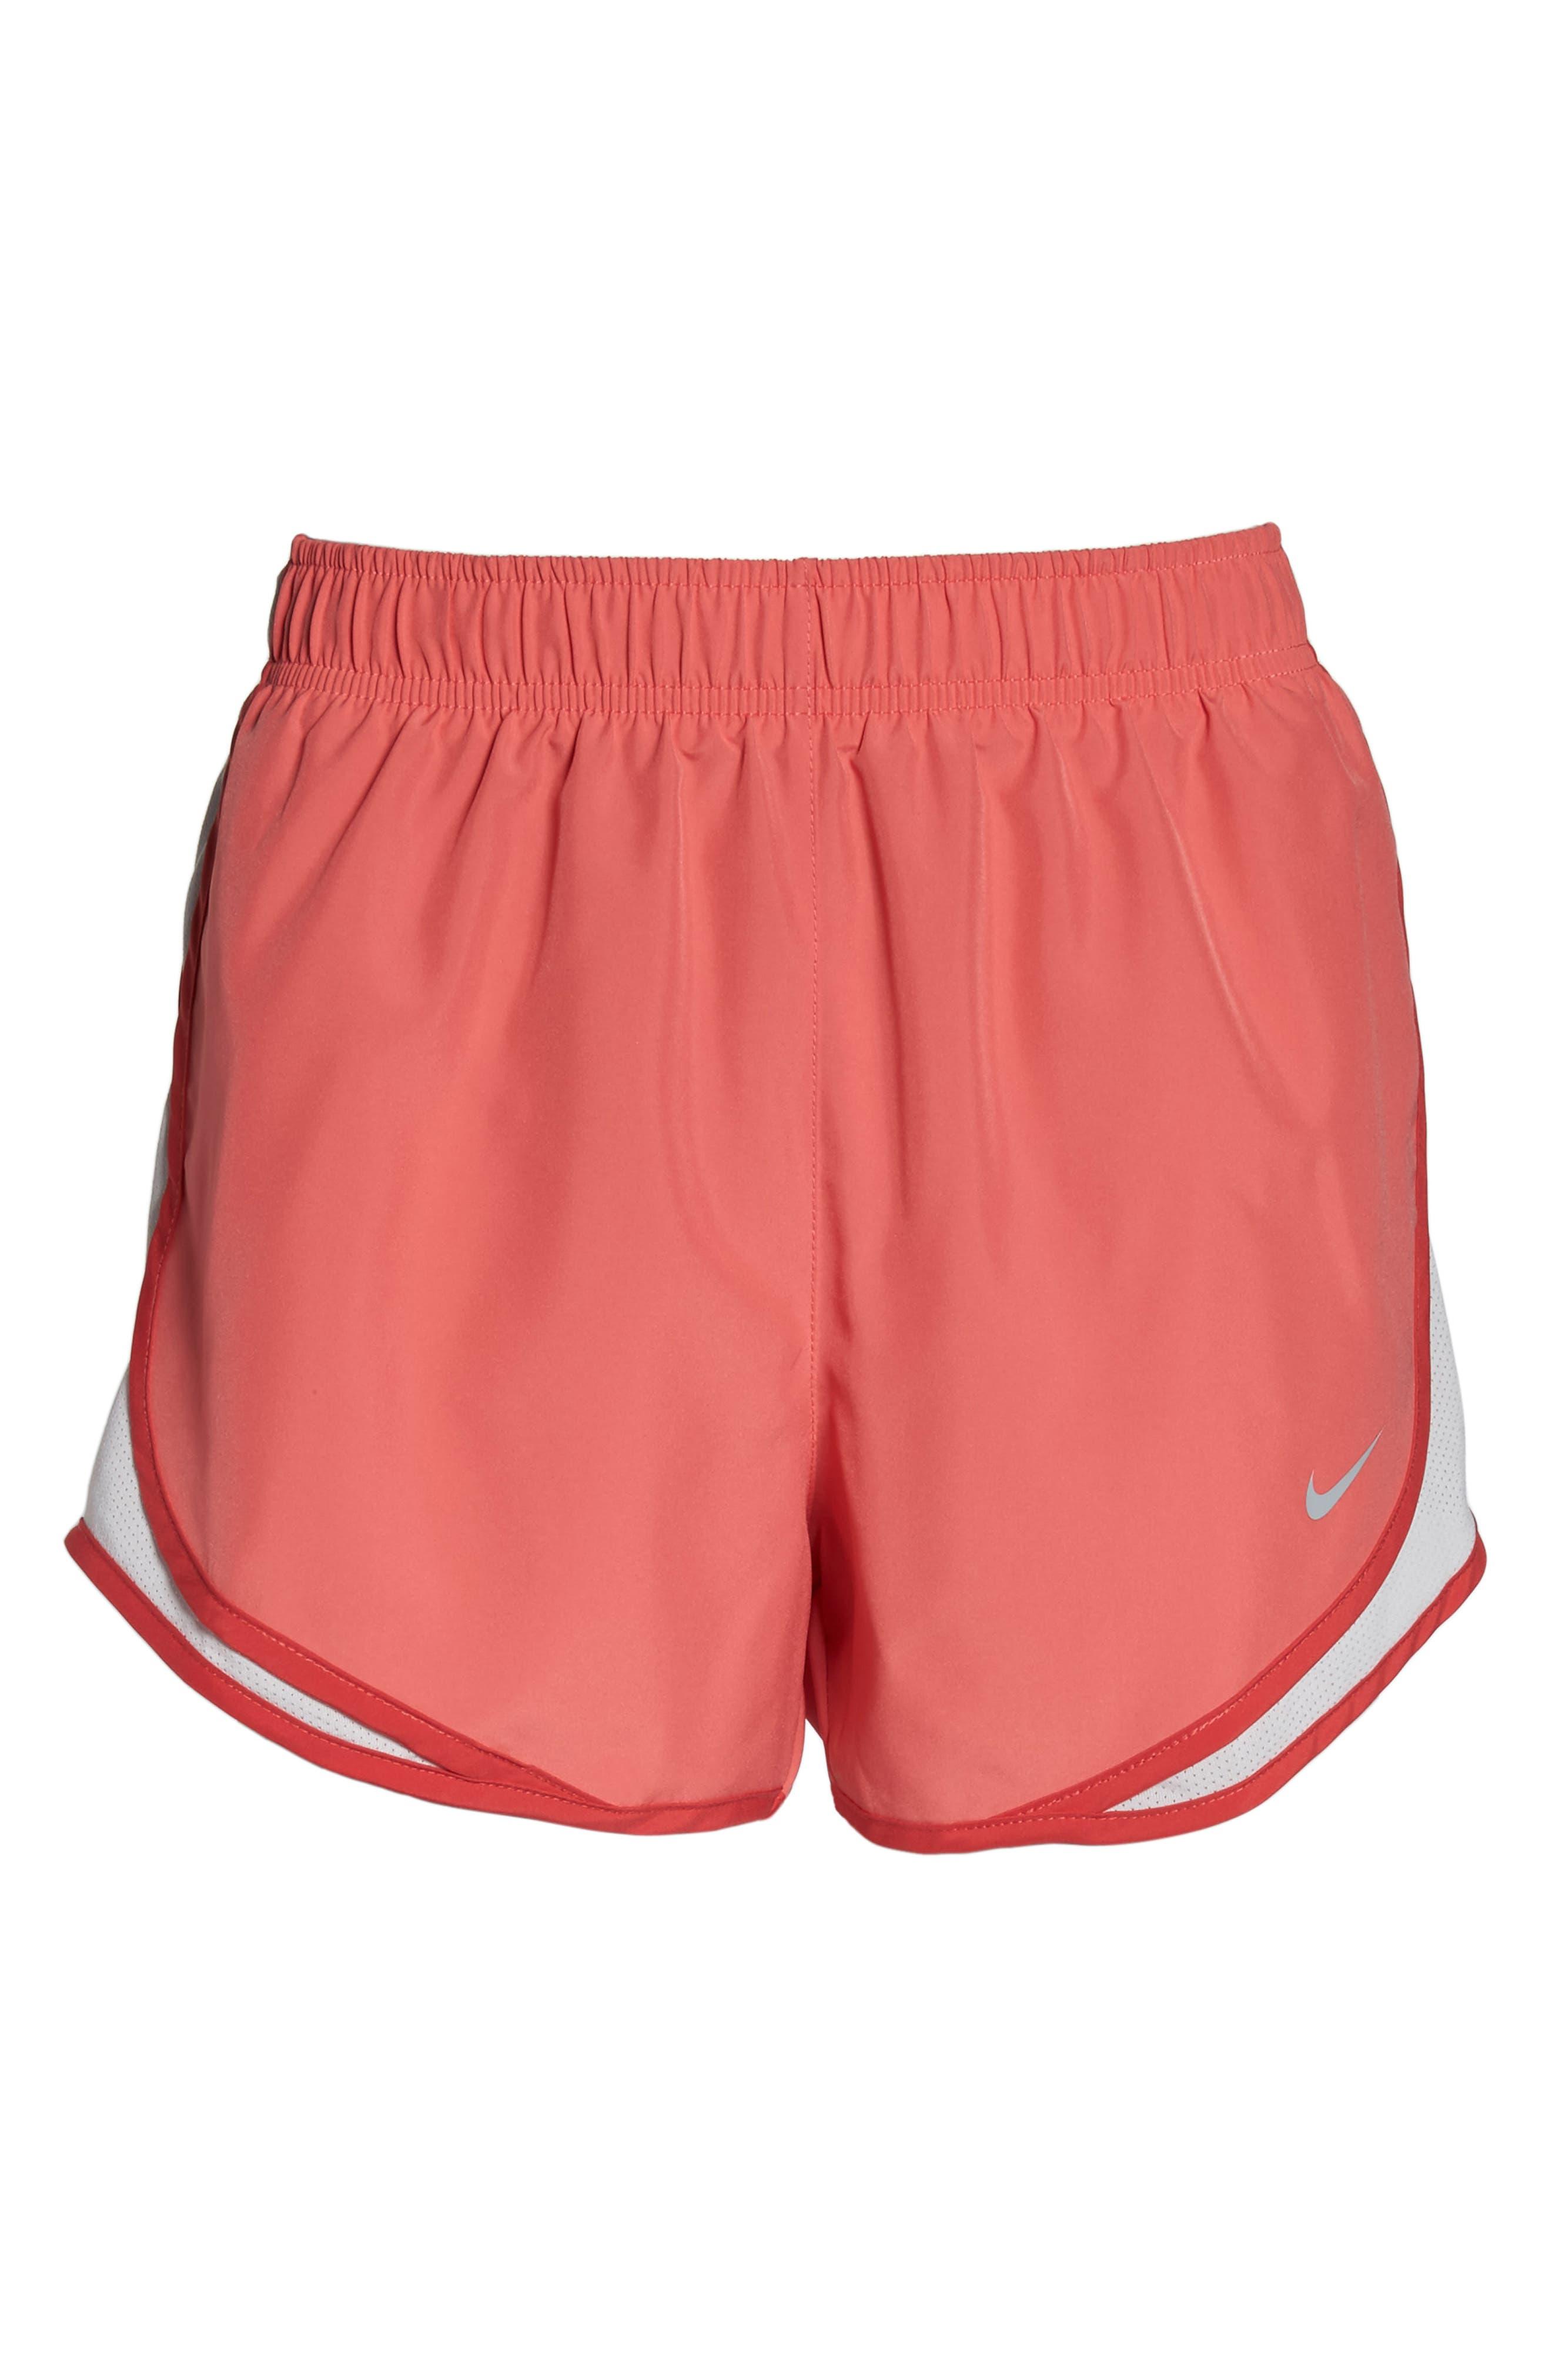 Dry Tempo Running Shorts,                             Alternate thumbnail 453, color,